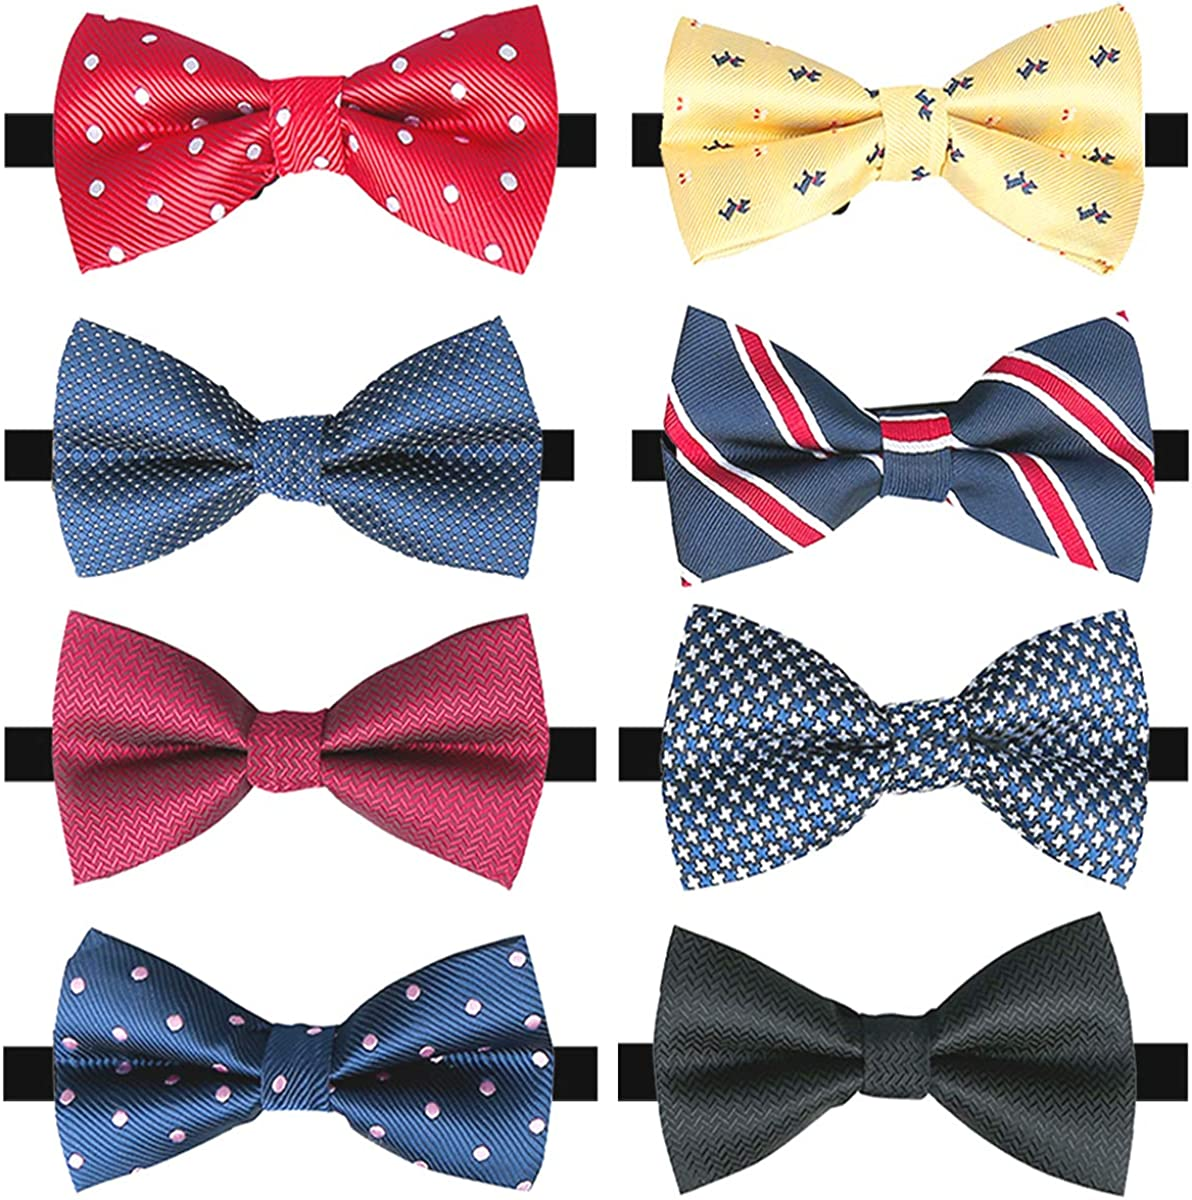 Elegant Fashionable Pre-tied Bow ties Formal Bowtie with Adjustab Set Tuxedo Ranking TOP7